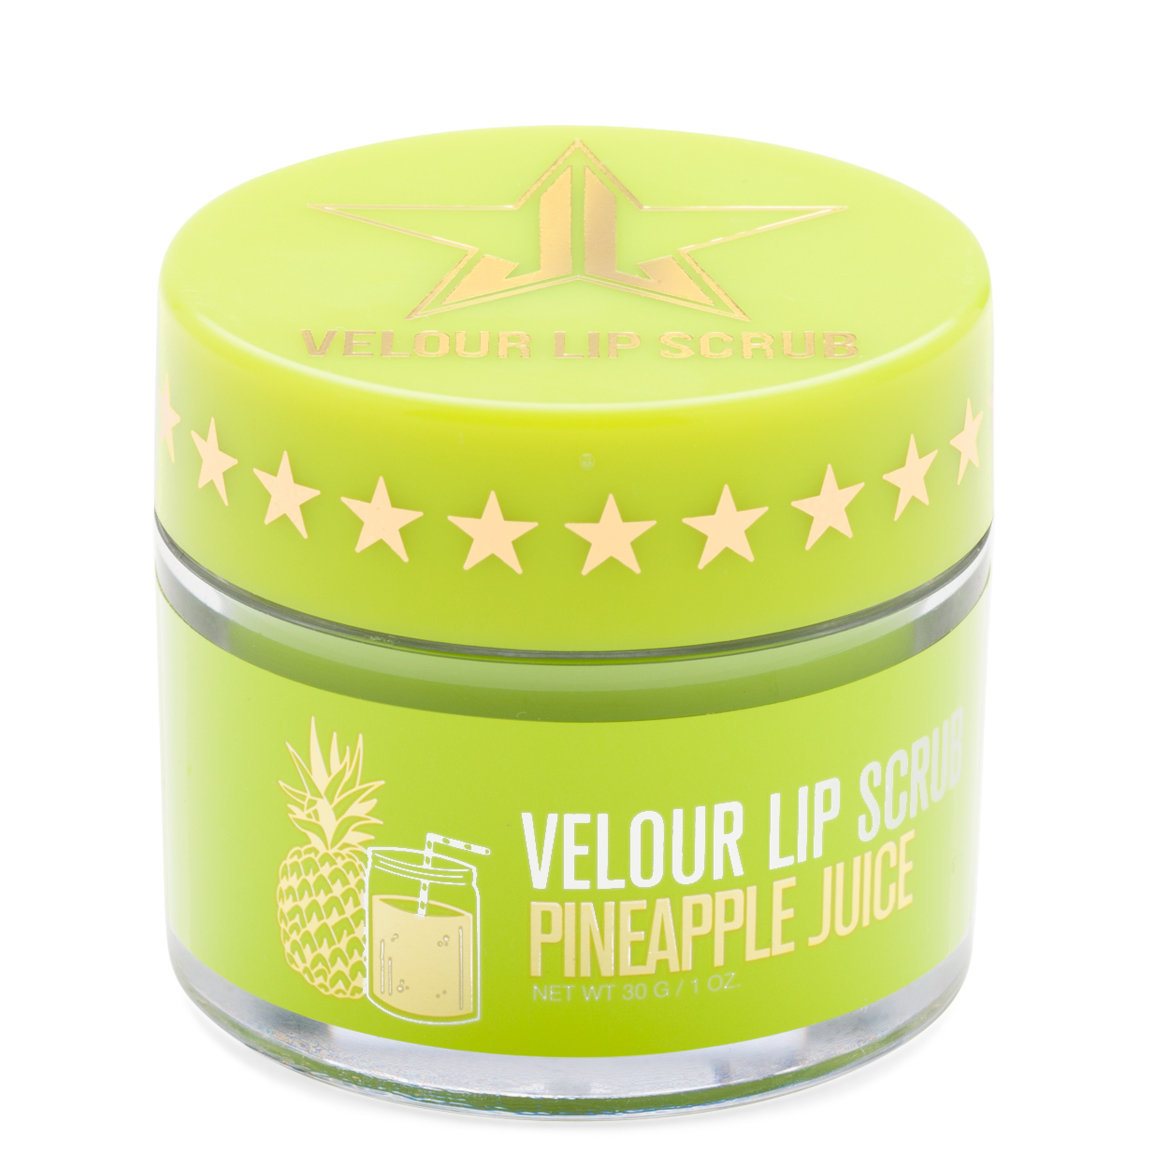 Jeffree Star Cosmetics Velour Lip Scrub Pineapple Juice